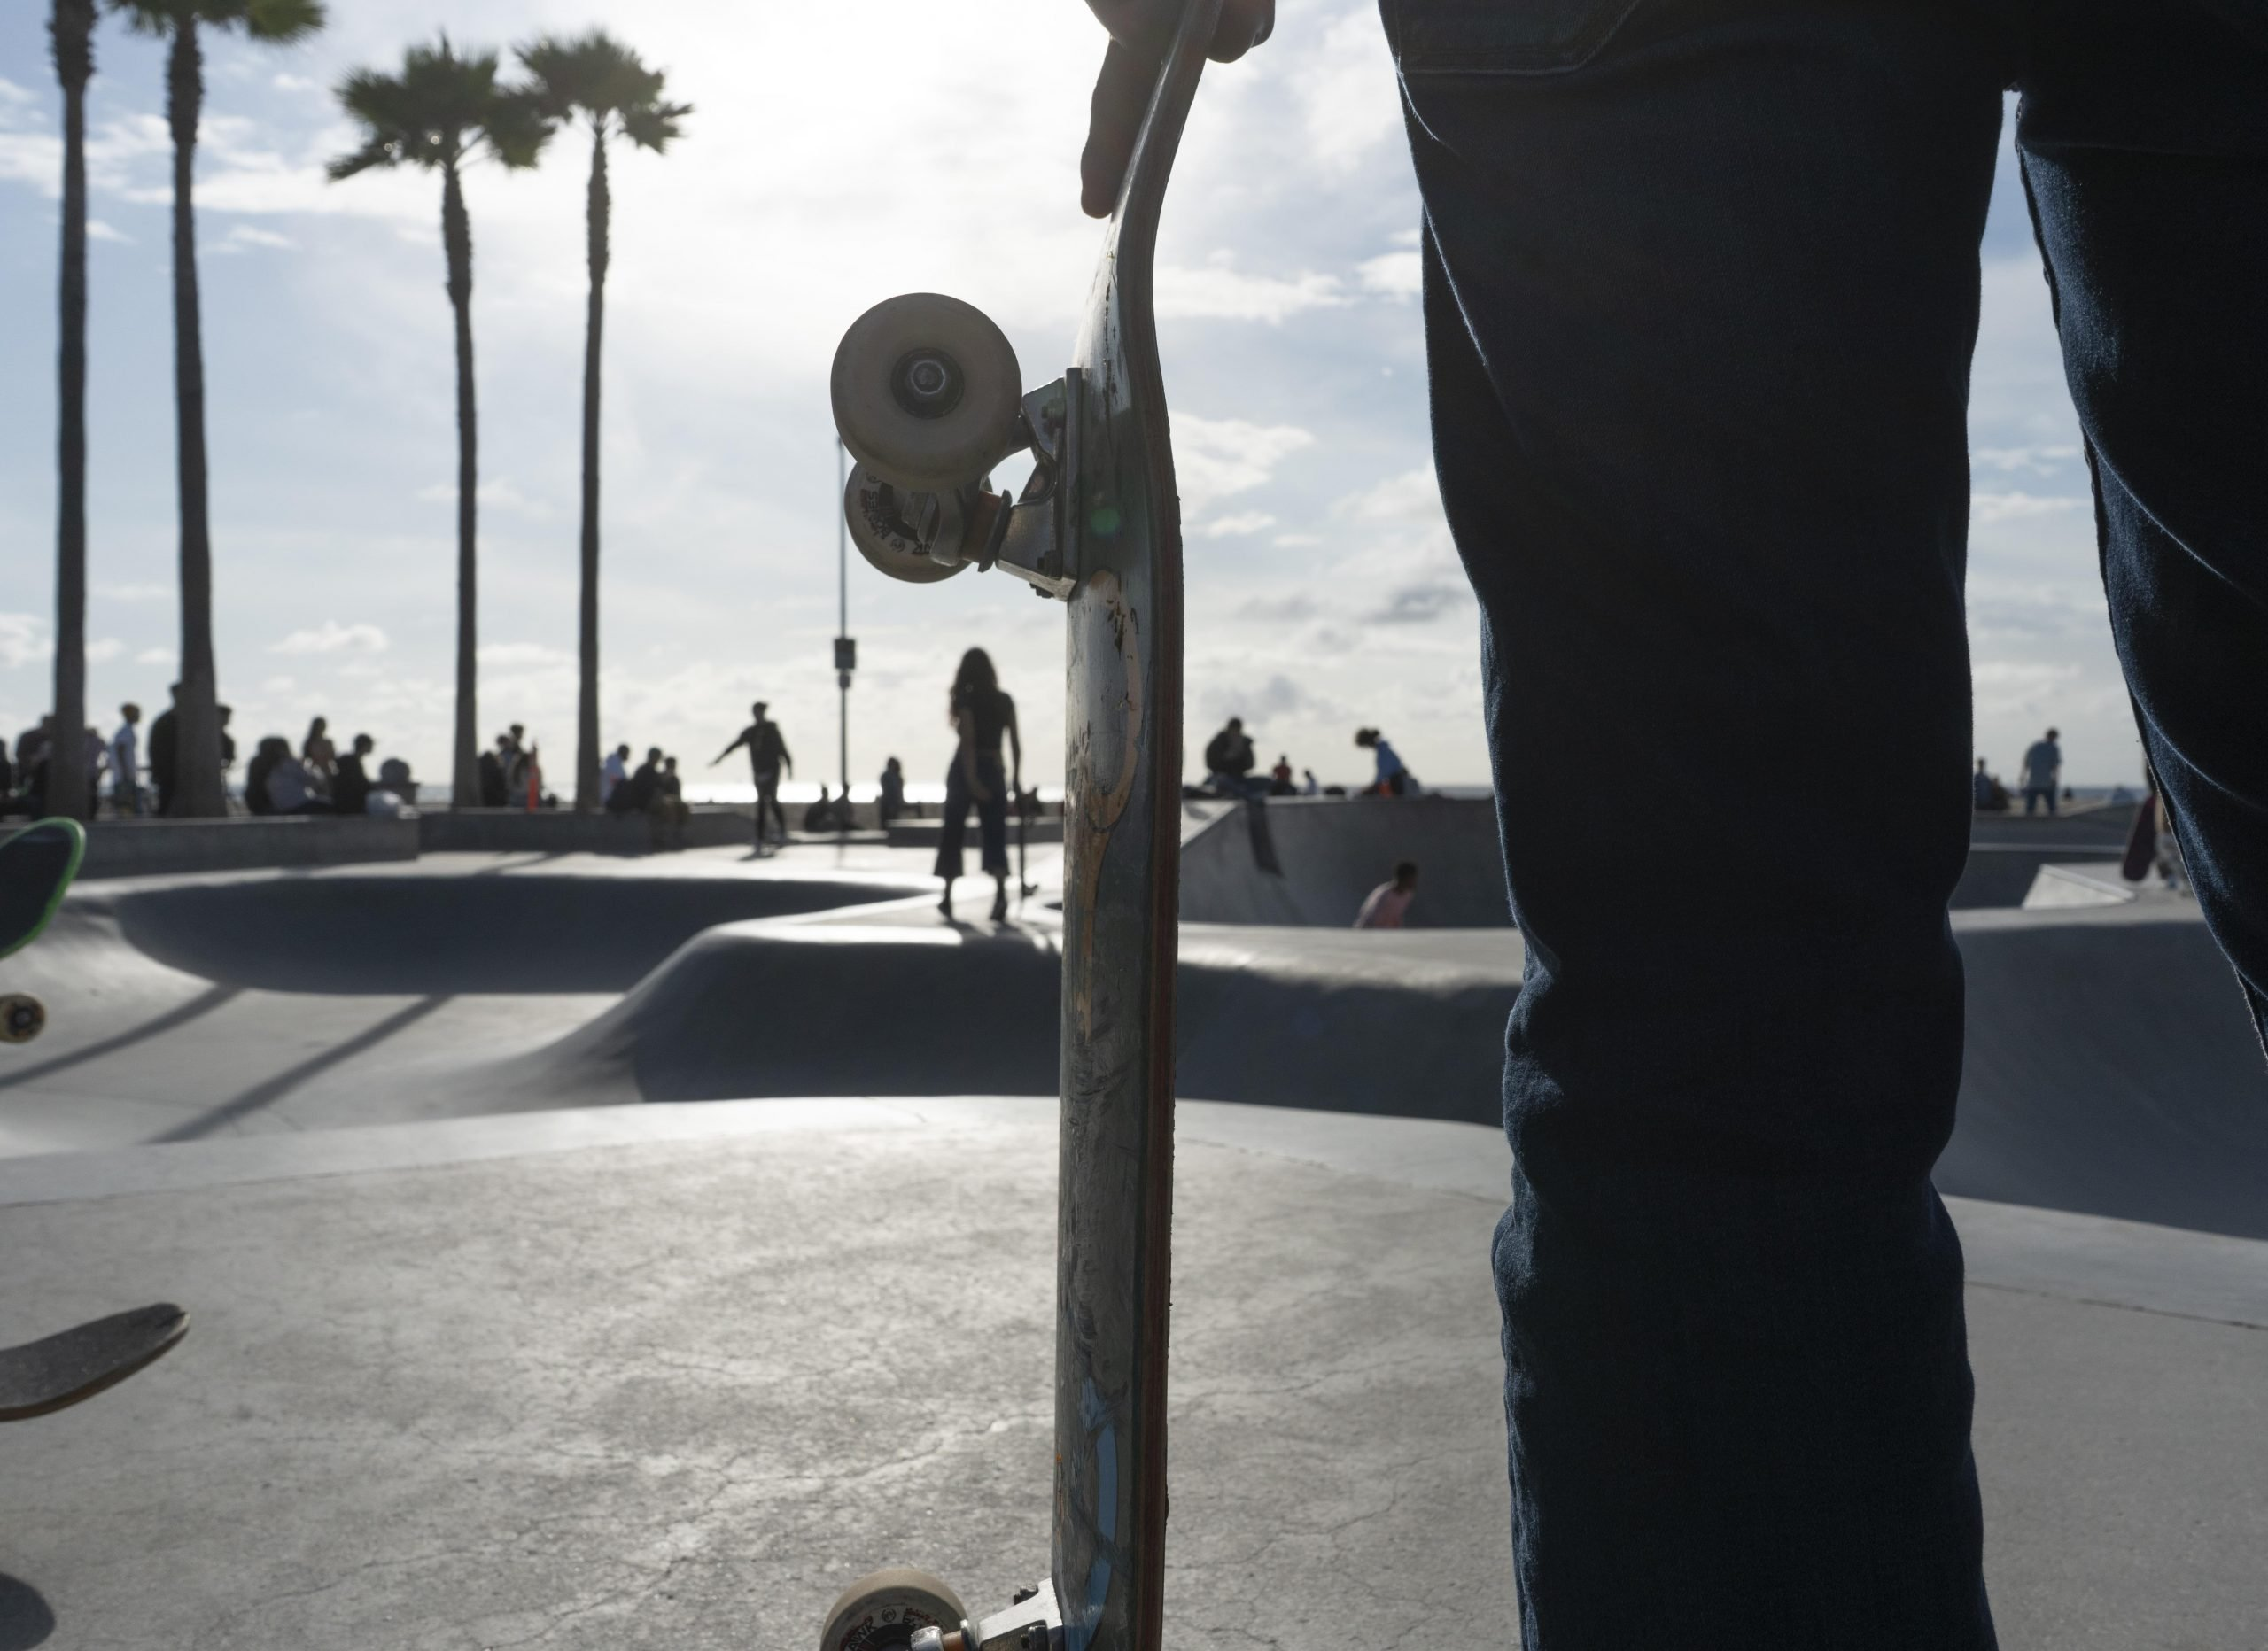 Skateboard park in Los Angeles.